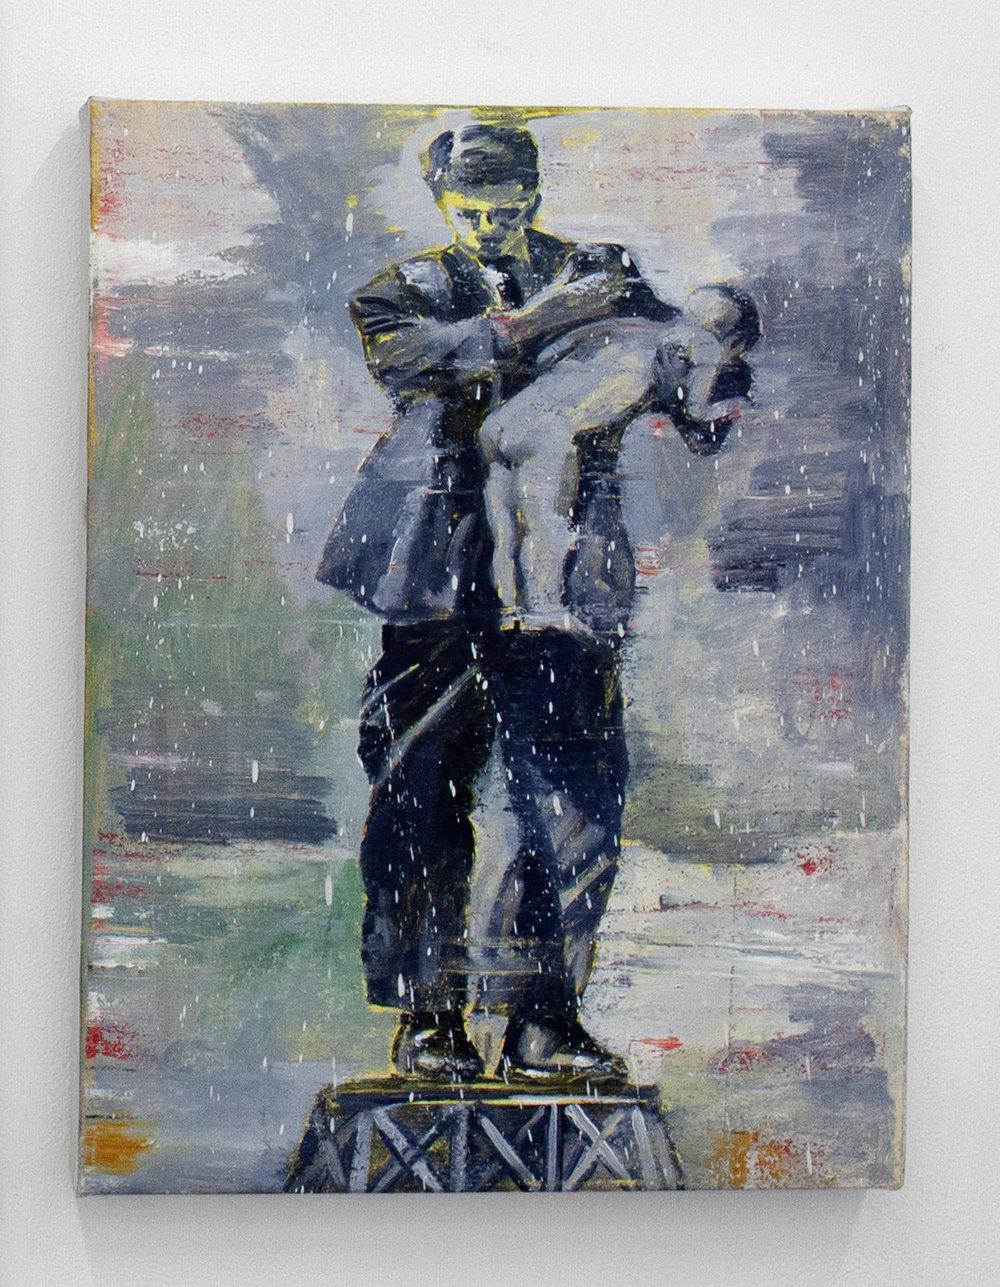 "Nicky Nodjoumi, Spanking The Bad Boy, oil on canvas, 15""x11 1/2"", 2015"